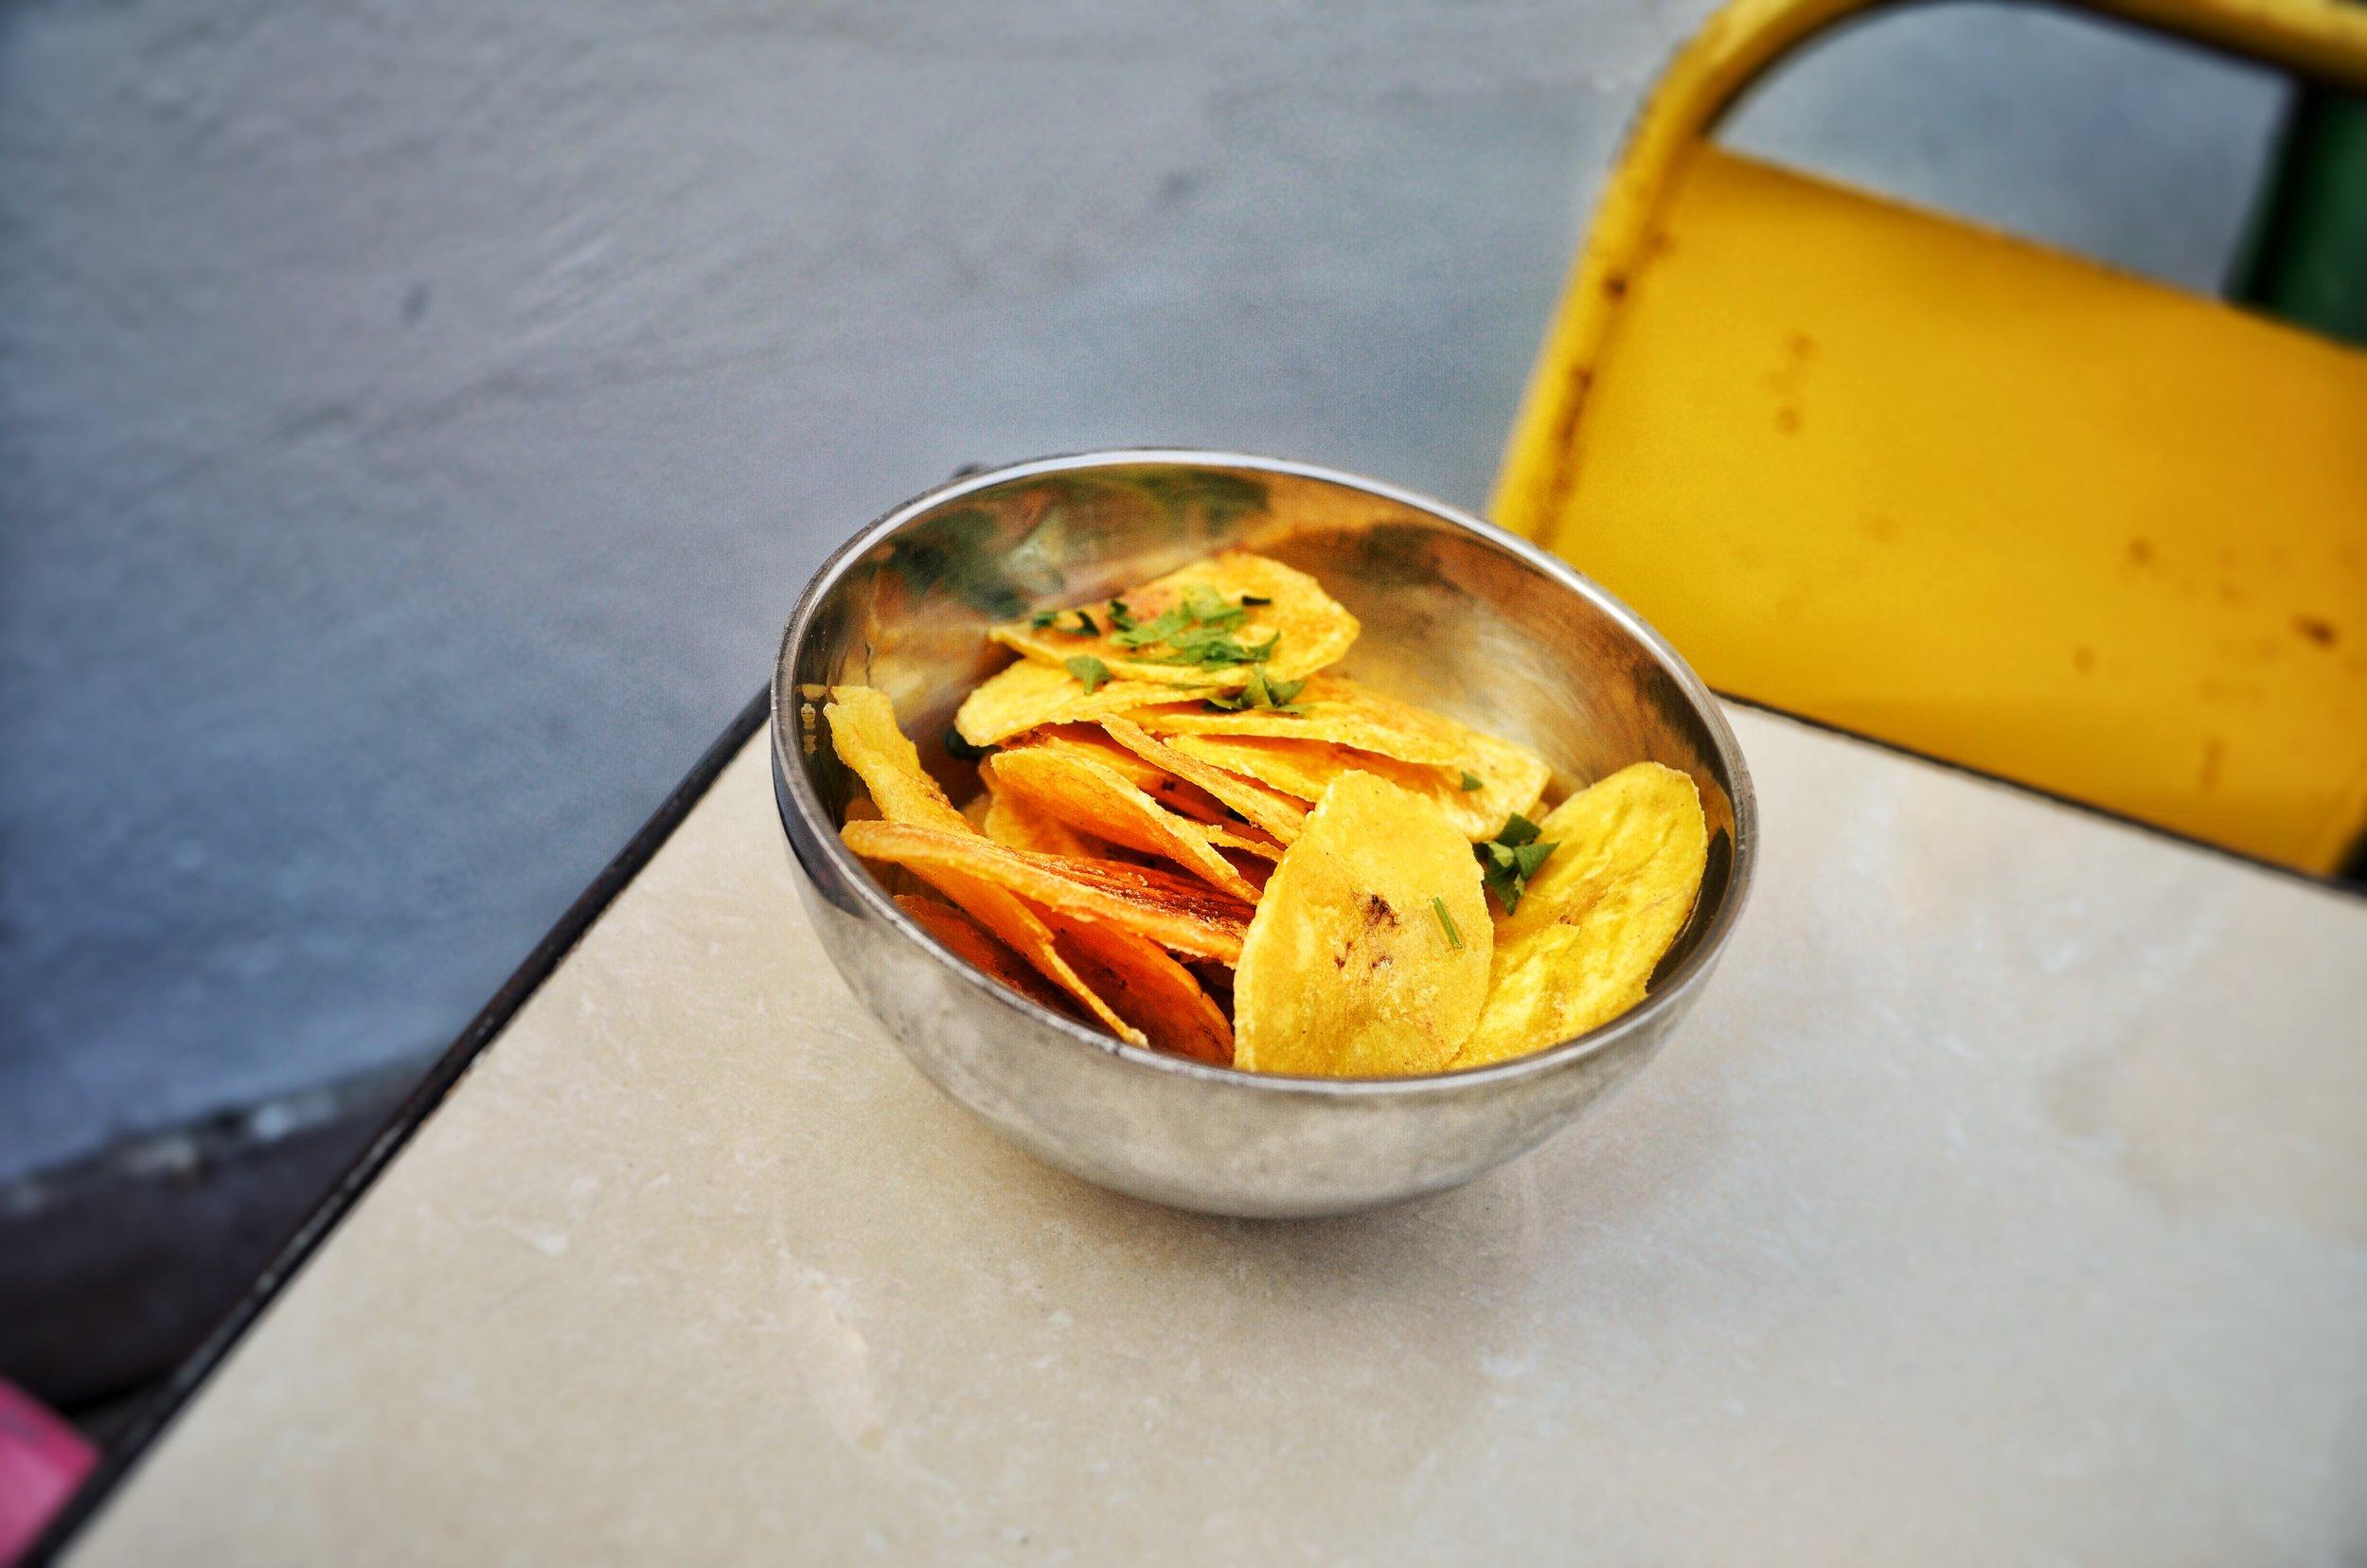 Plaintain Chips at El del Frente Restaurant, Havana, Cuba